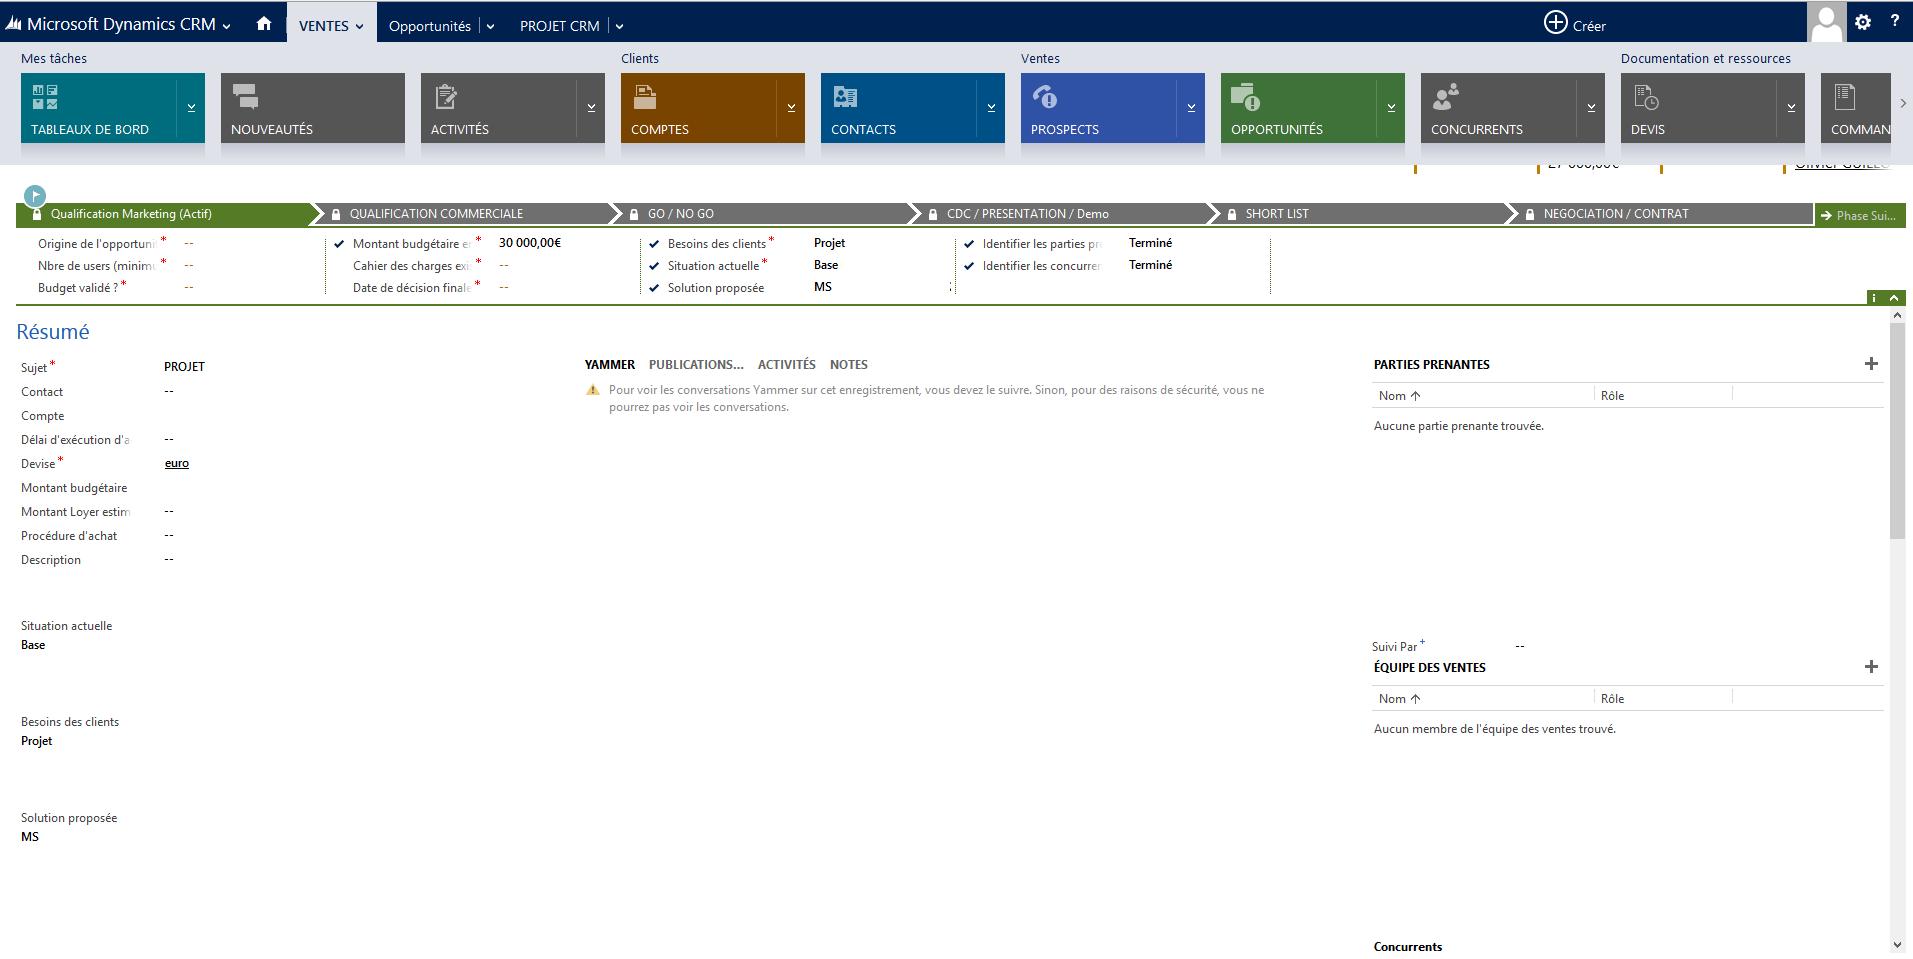 Microsoft Dynamics CRM: Service Level Agreement (SLA), Phone, Mobile Application